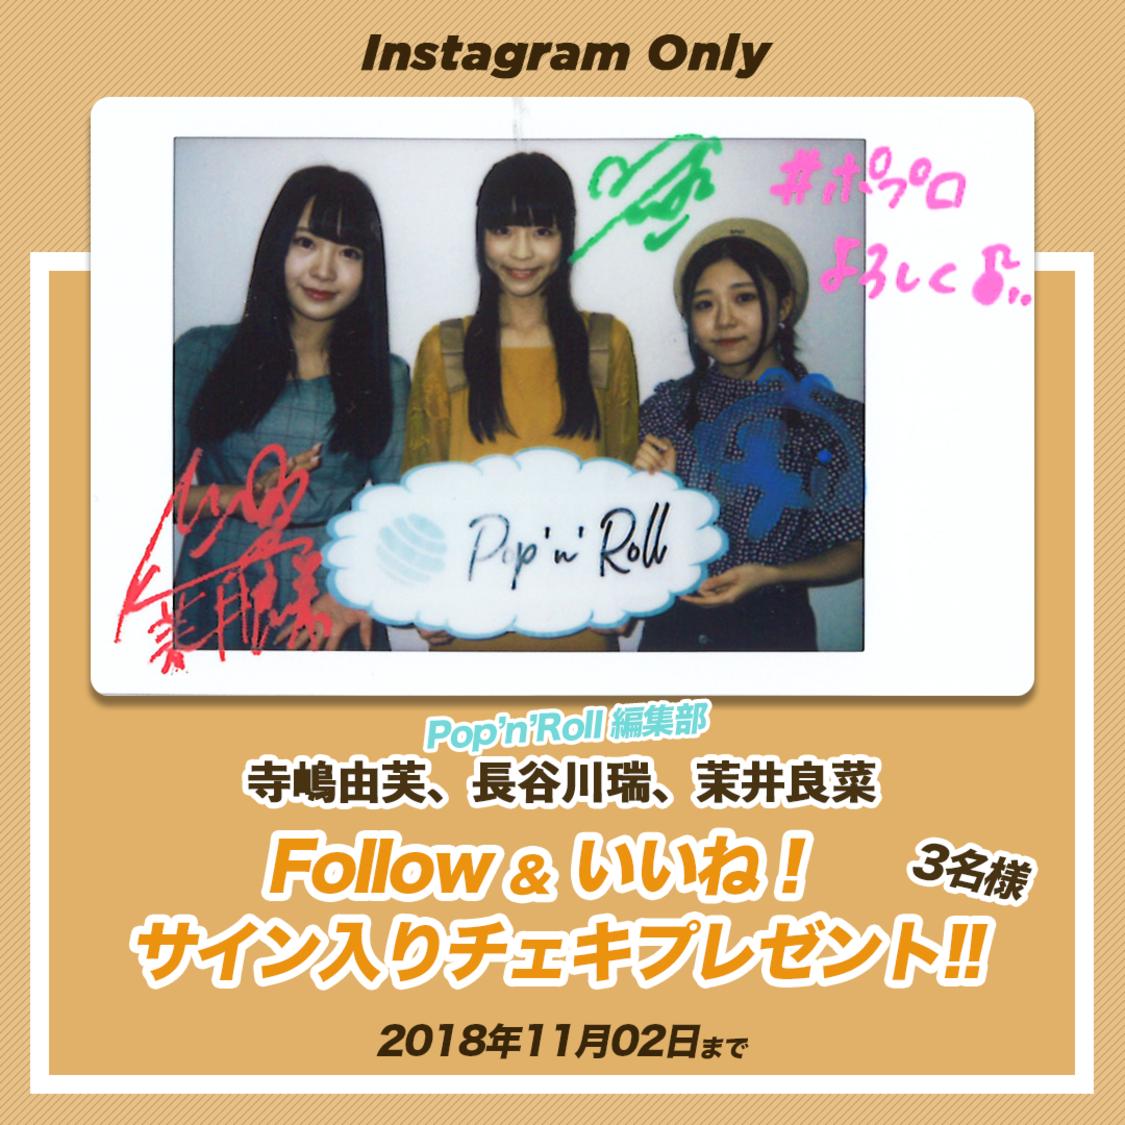 Pop'n'Roll 編集部 寺嶋由芙、長谷川瑞、茉井良菜サイン入りチェキプレゼント